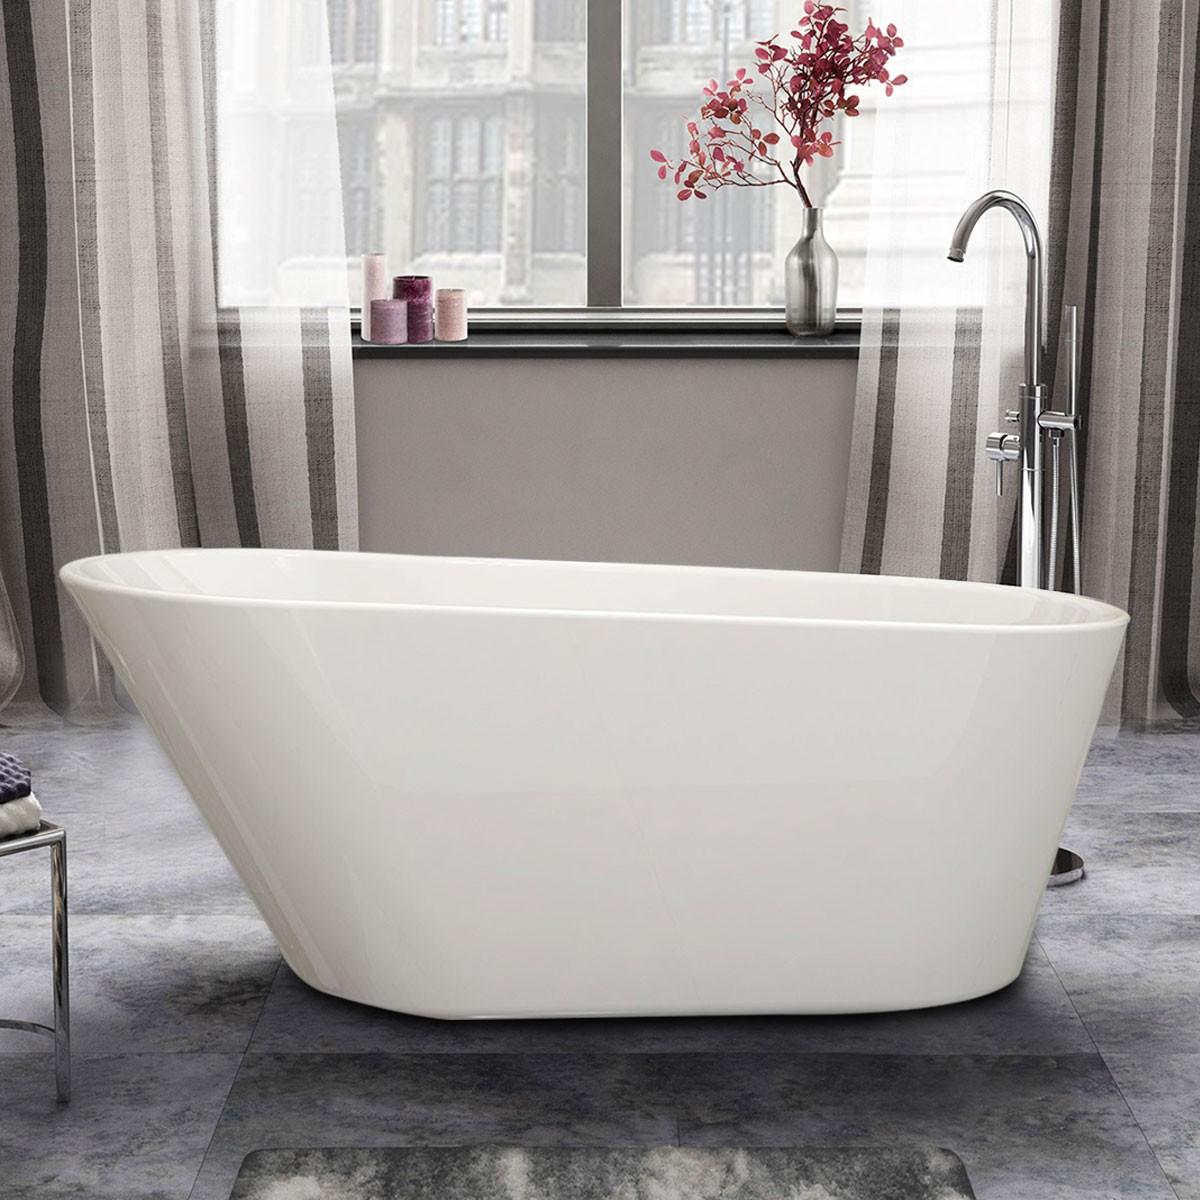 61 In Seamless White Acrylic Freestanding Bathtub (DK-PW-1506B)